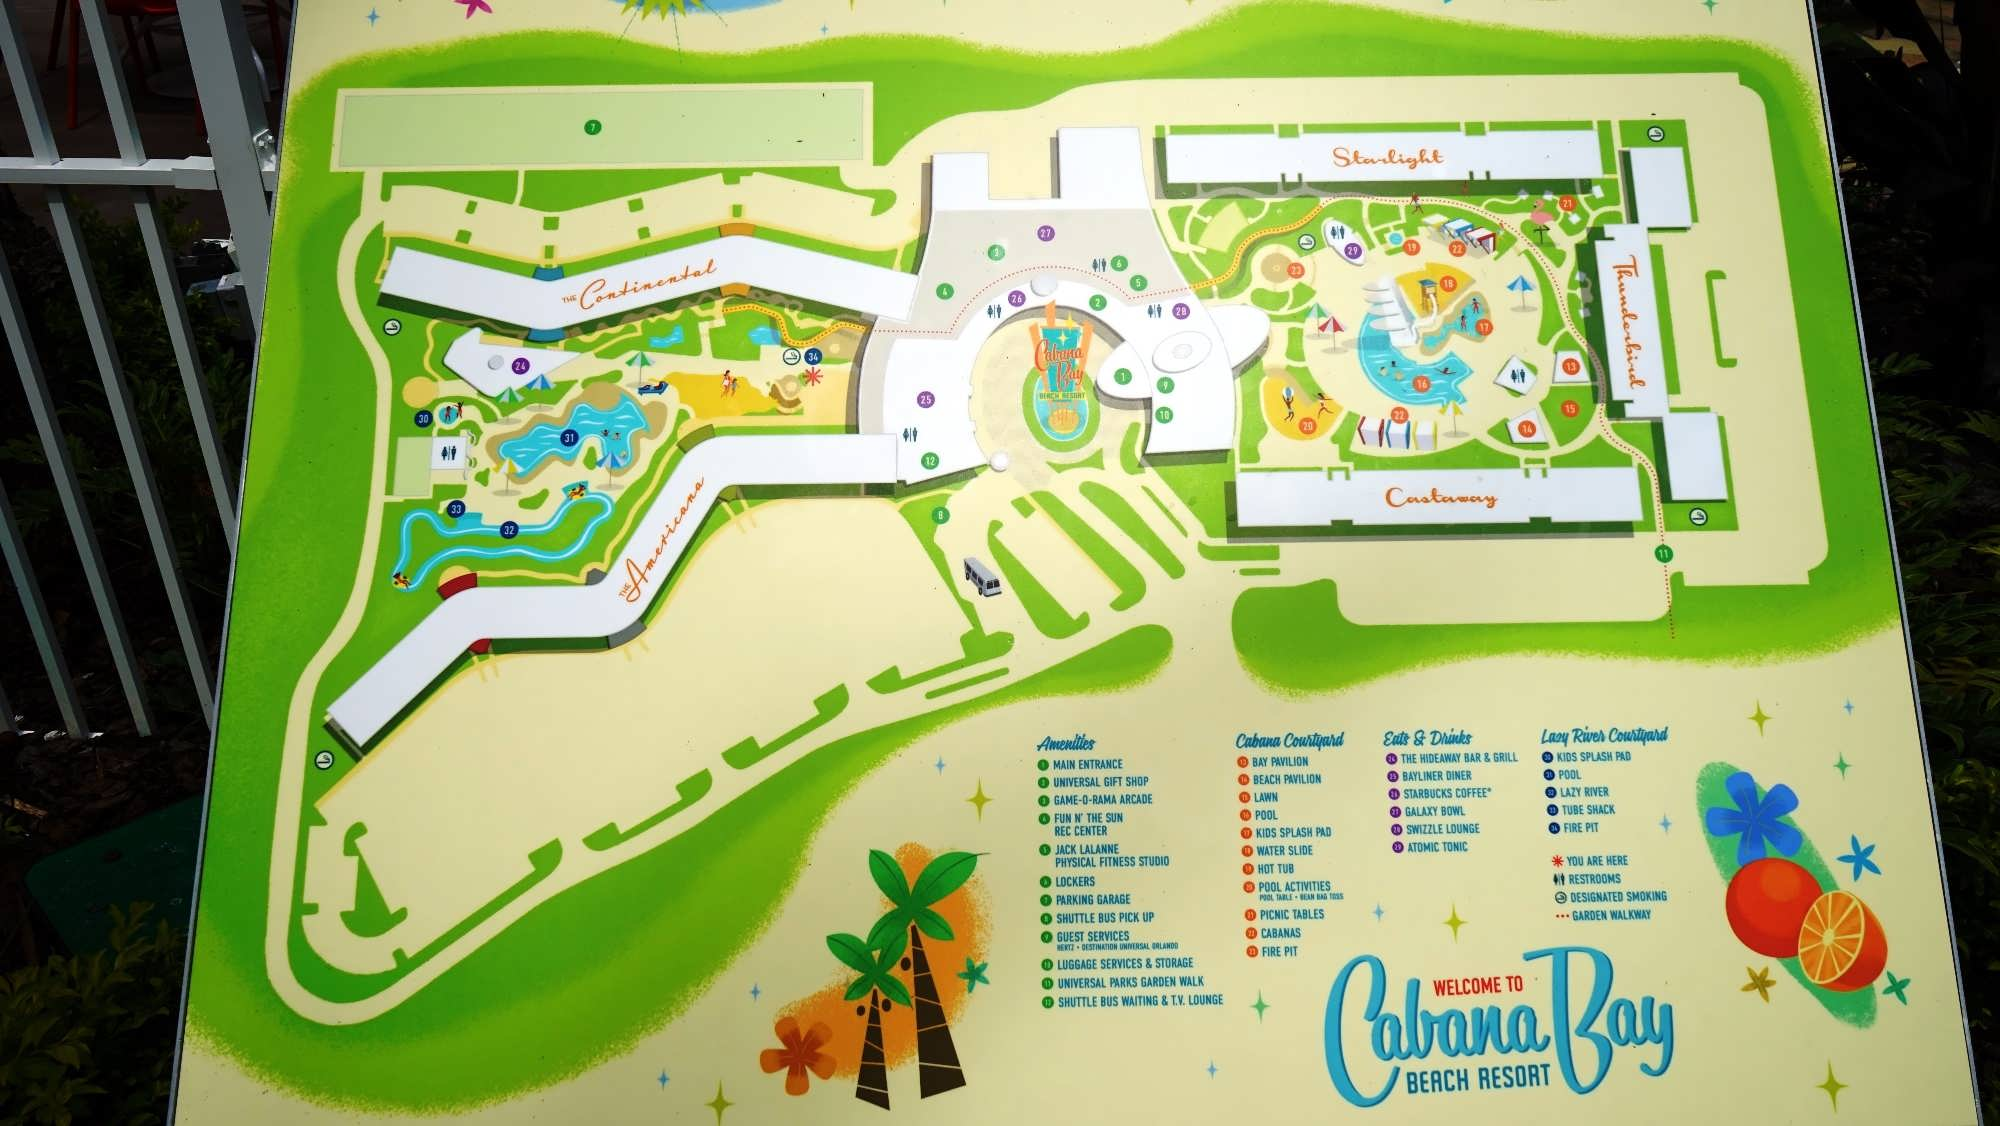 Cabana Bay Beach Resort: Pool areas - photo gallery, details, & more ...